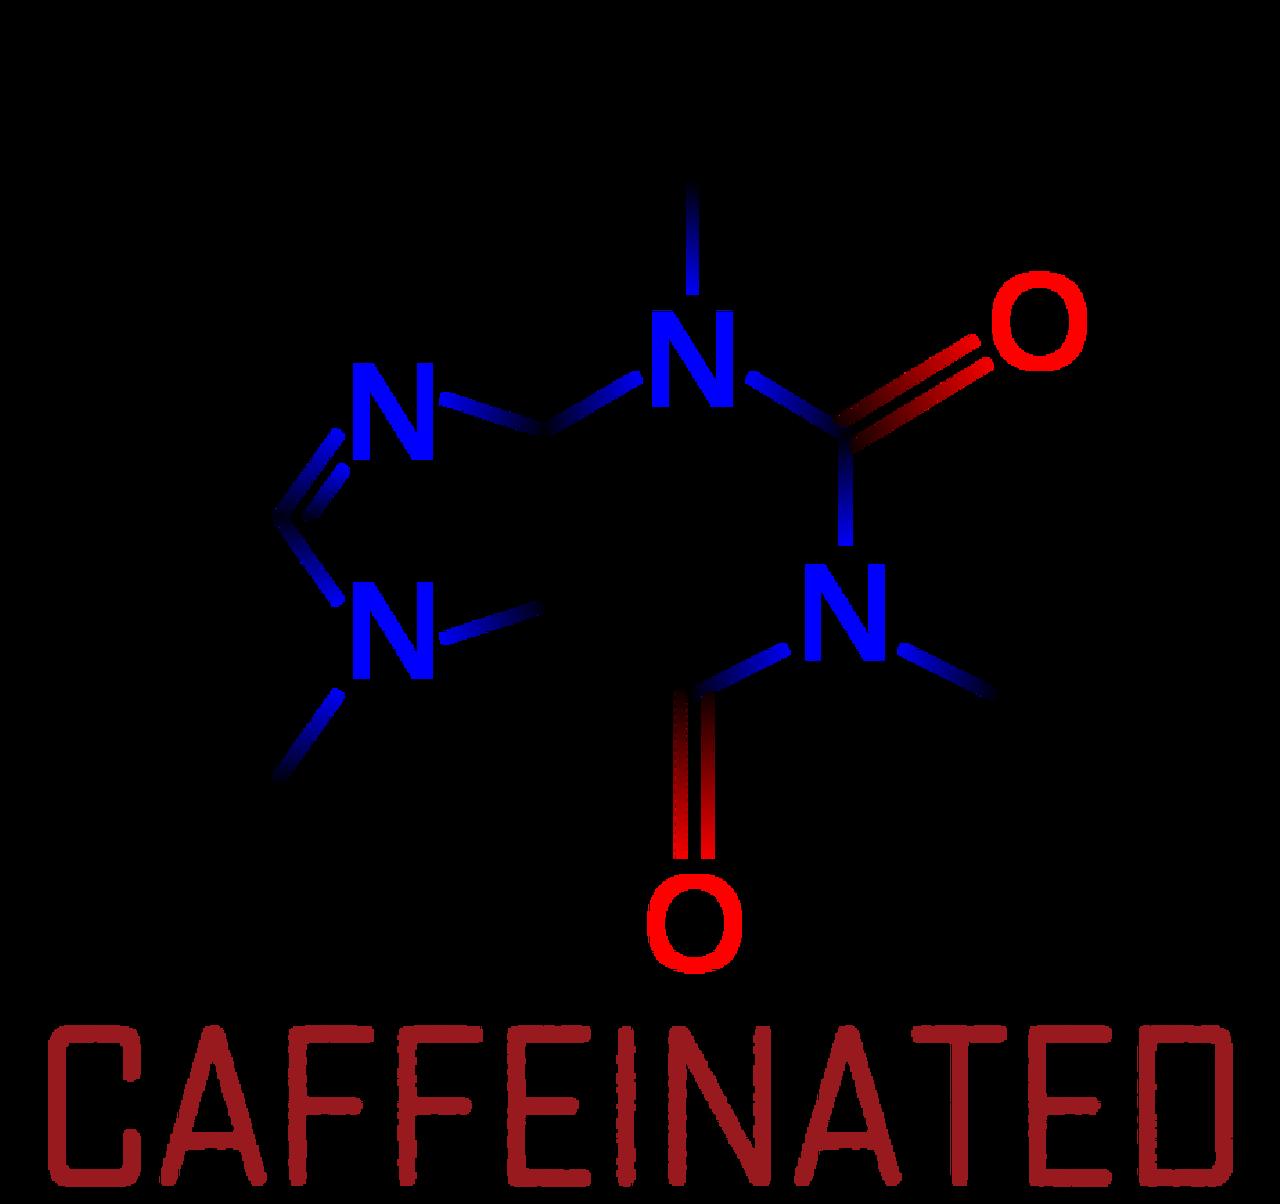 CAFFEINATED PROTEIN